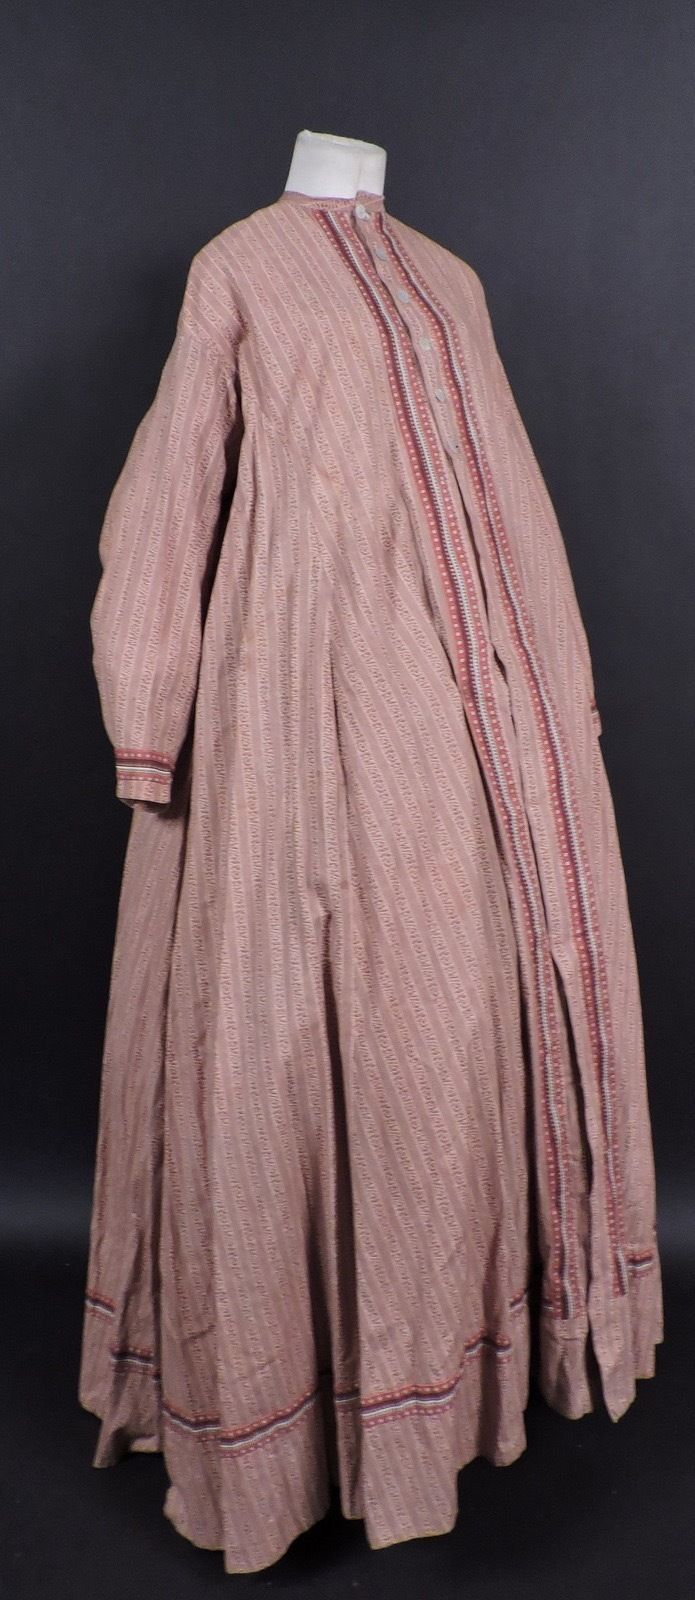 Civil war calico cotton maternity gown w full sweep ebay civil war calico cotton maternity gown w full sweep ebay ombrellifo Images